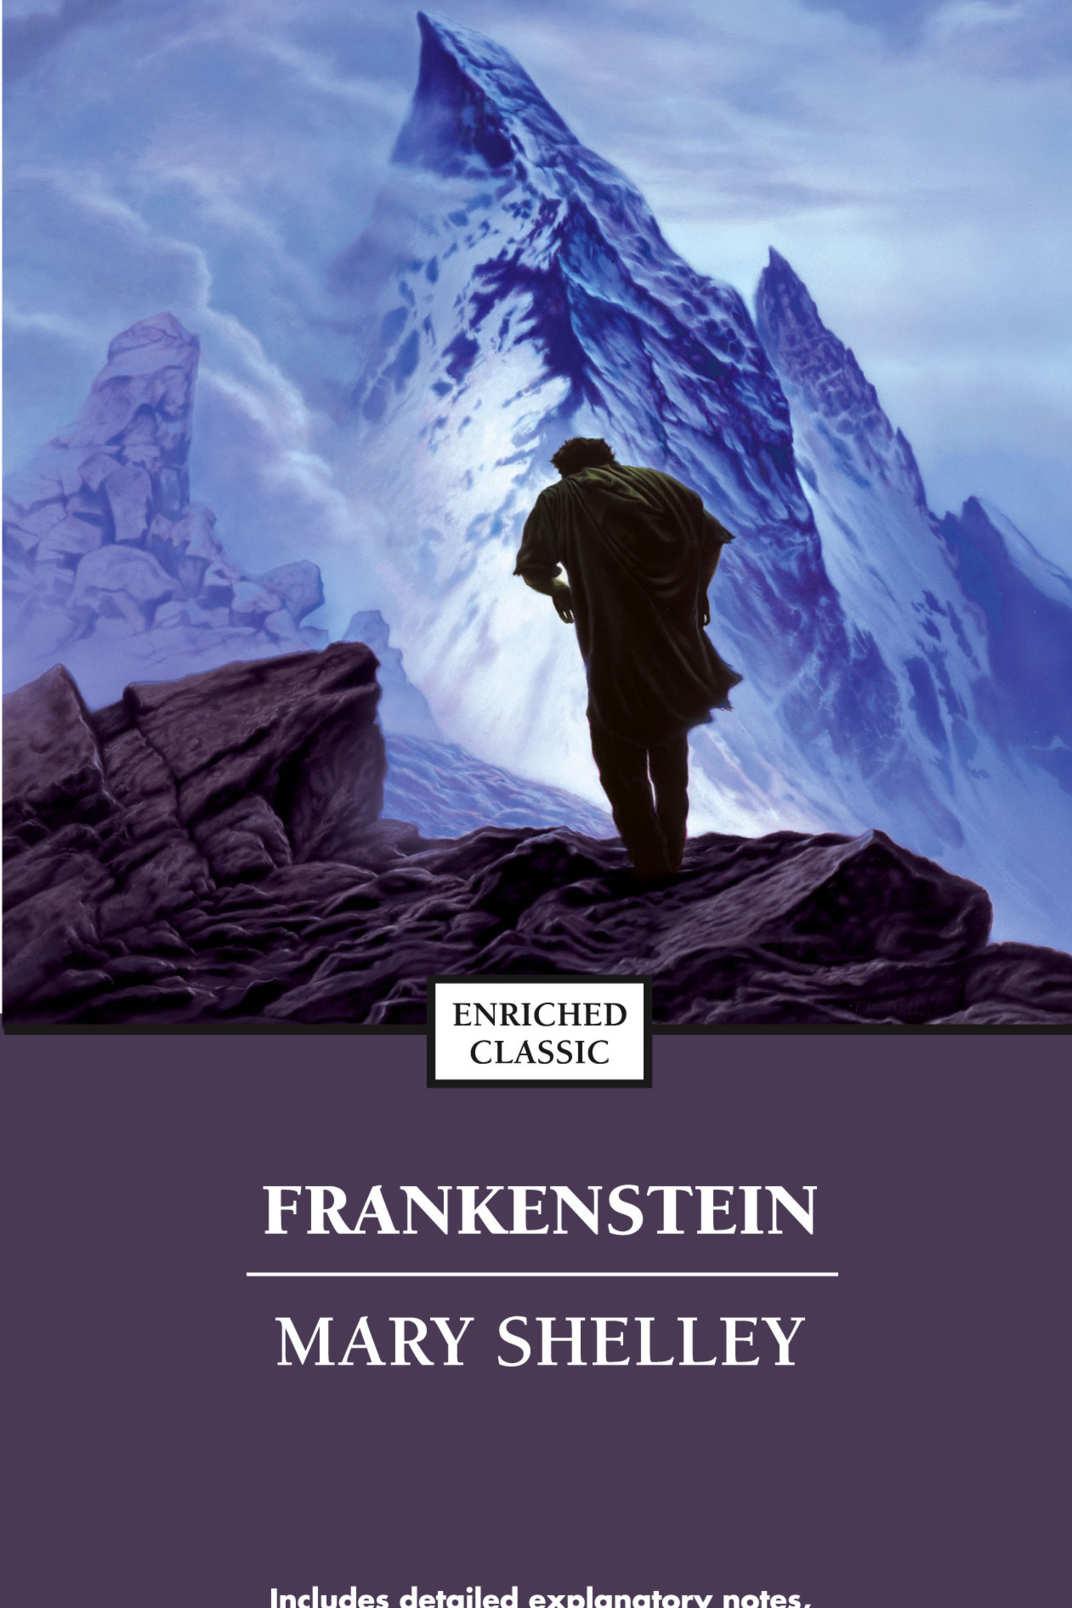 <em>Frankenstein</em>, by Mary Shelley